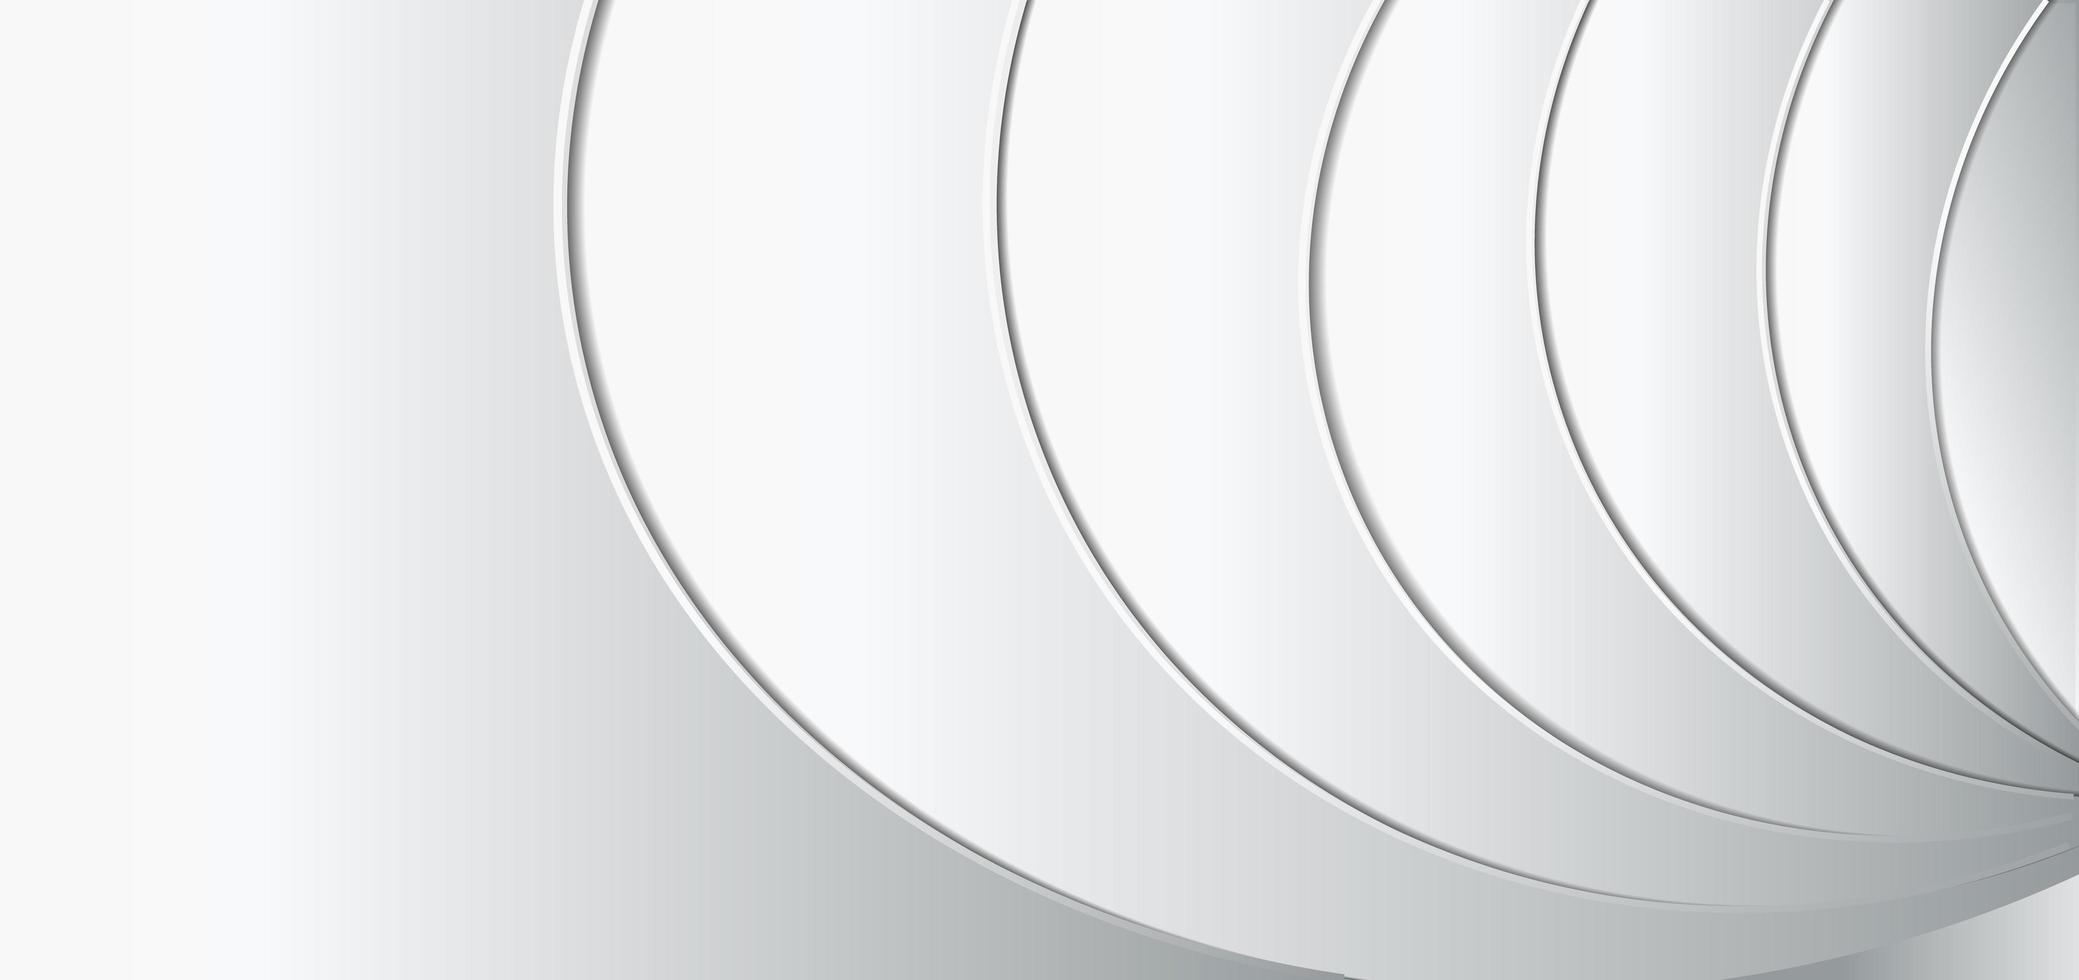 modelo abstrato fundo geométrico branco e cinza vetor